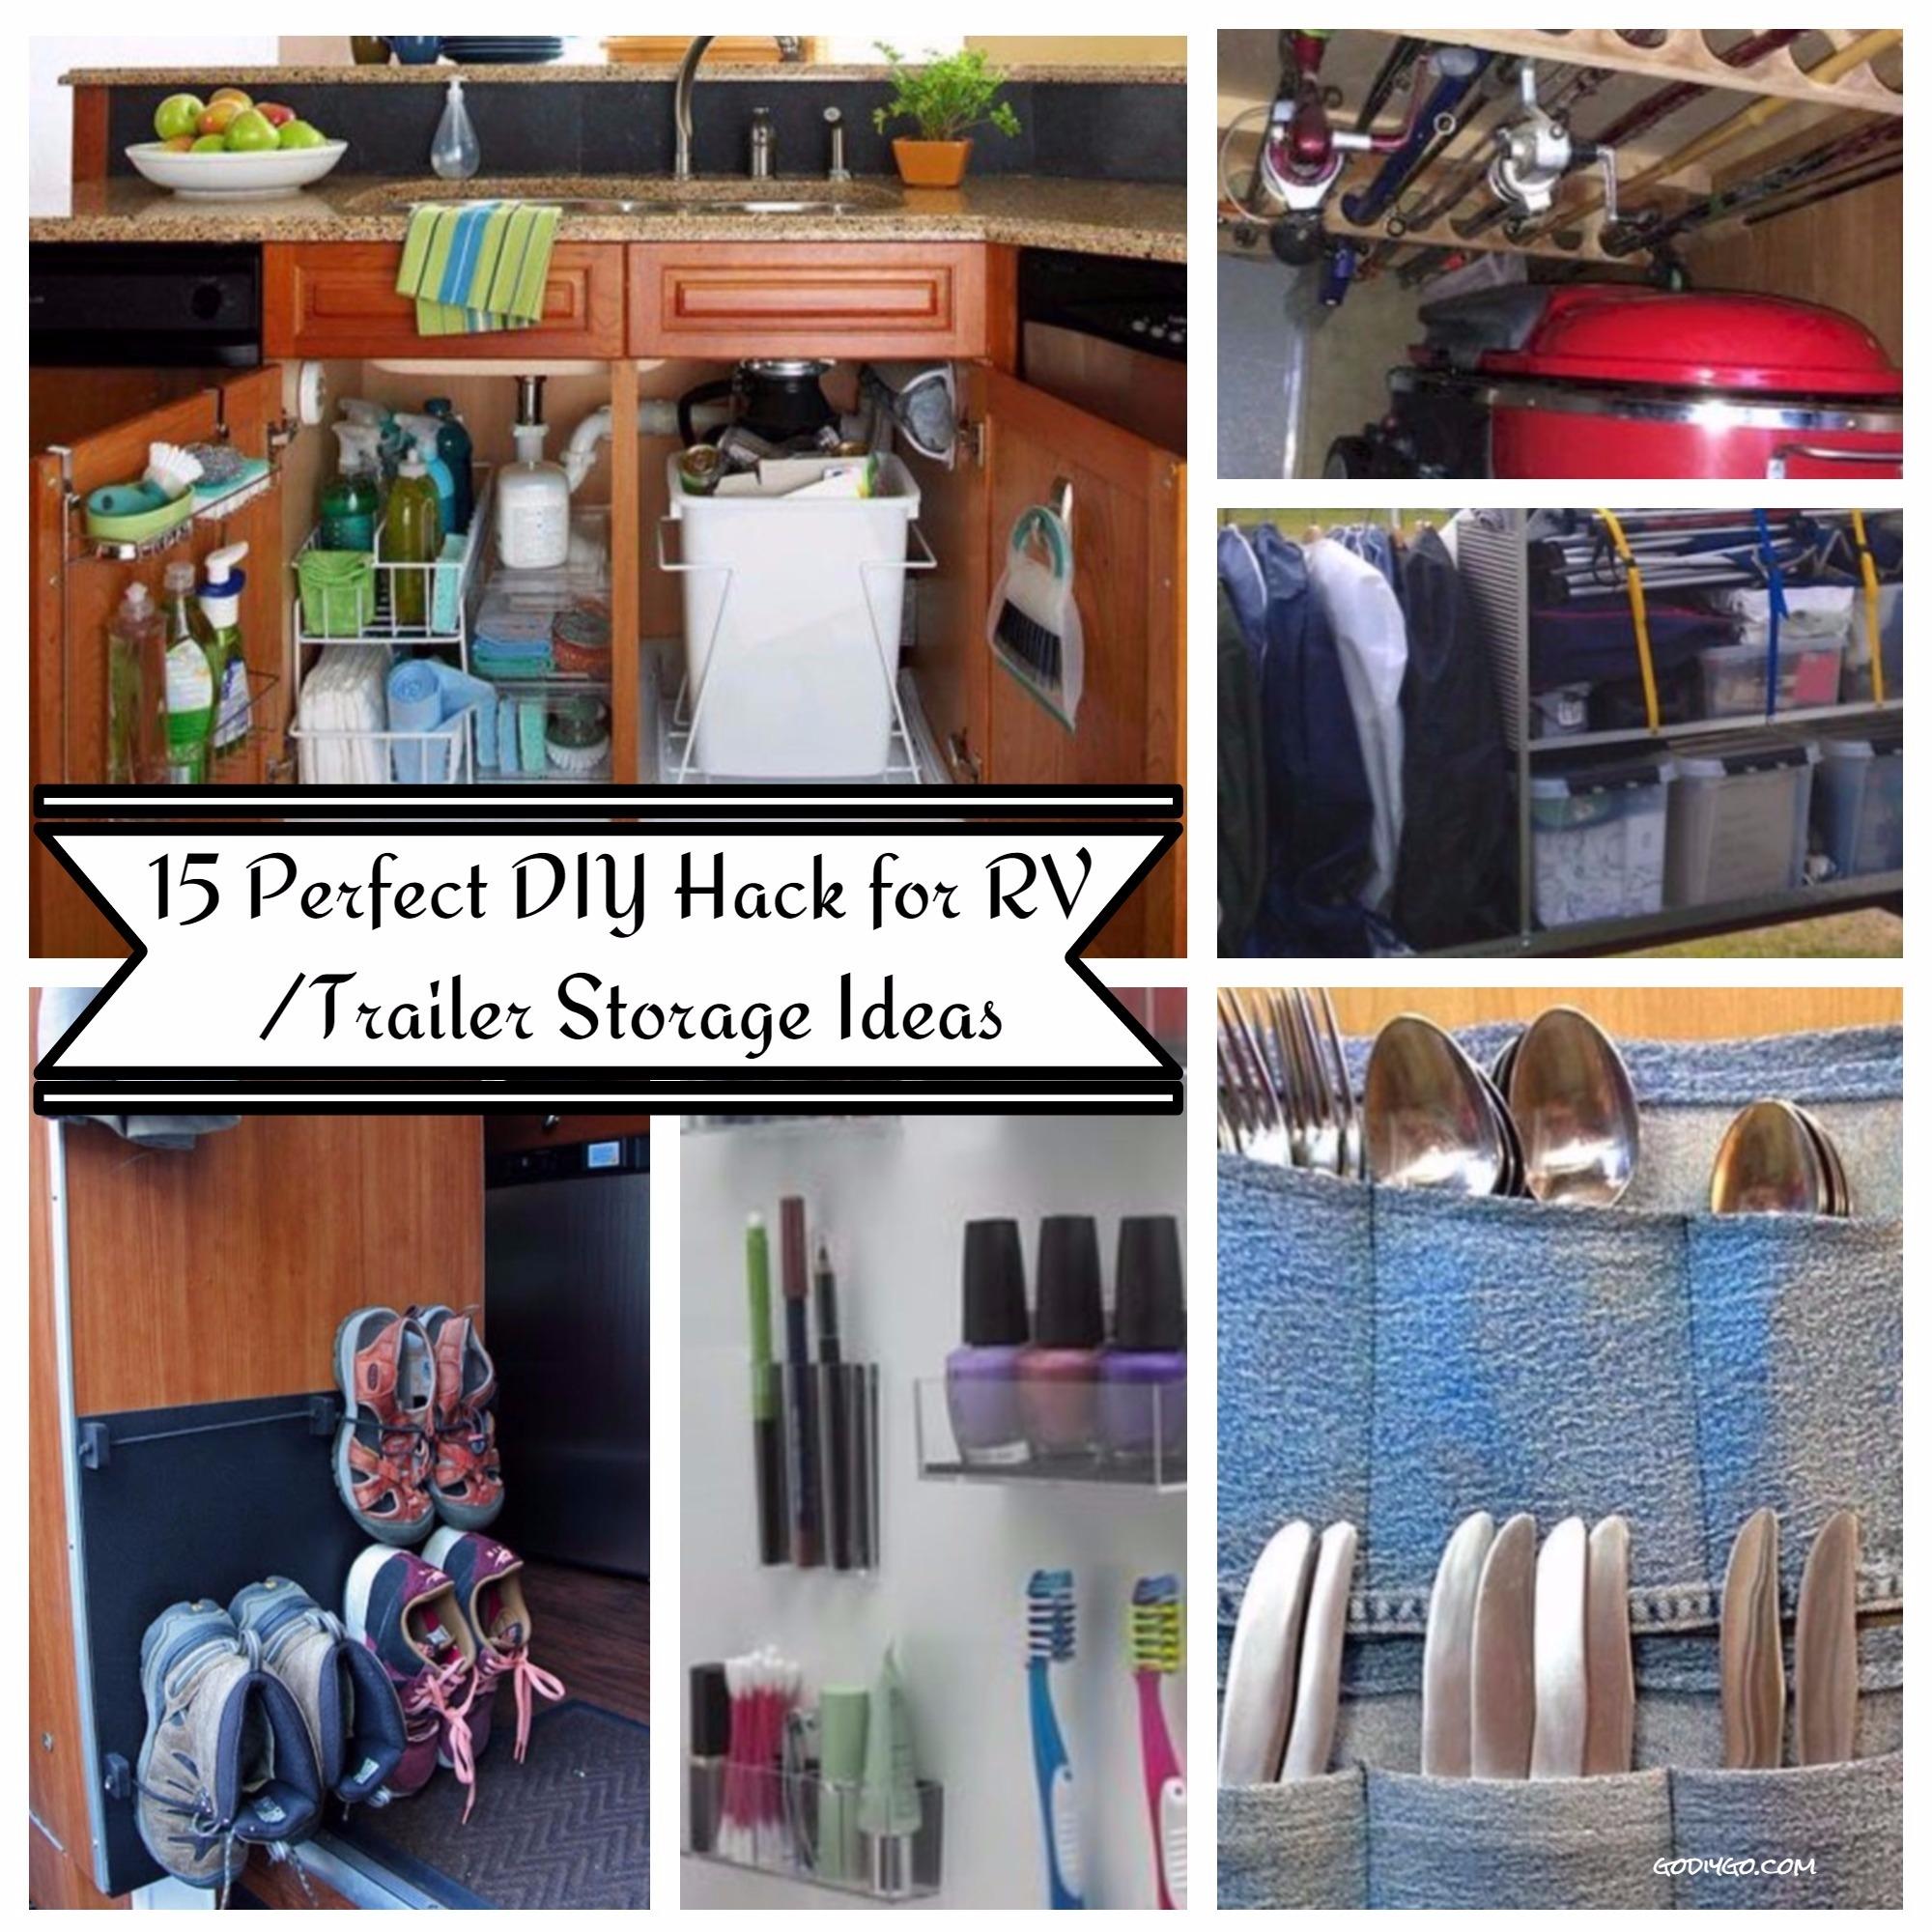 15 Perfect DIY Hack for RV Trailer Storage Ideas